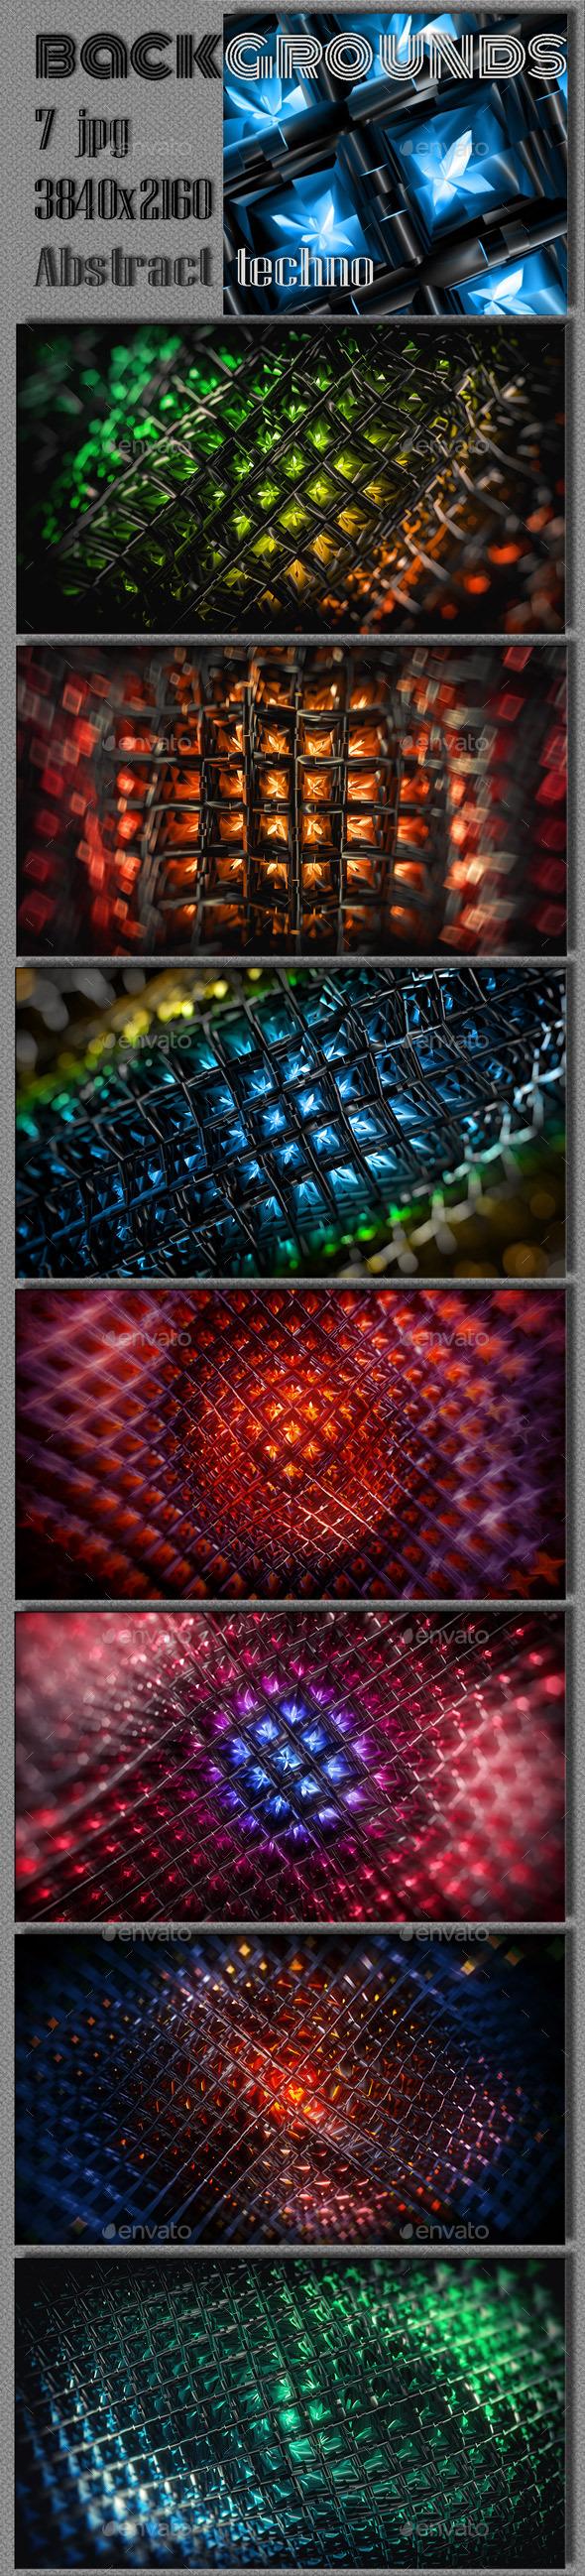 Techno Fiery Cluster Background - Tech / Futuristic Backgrounds